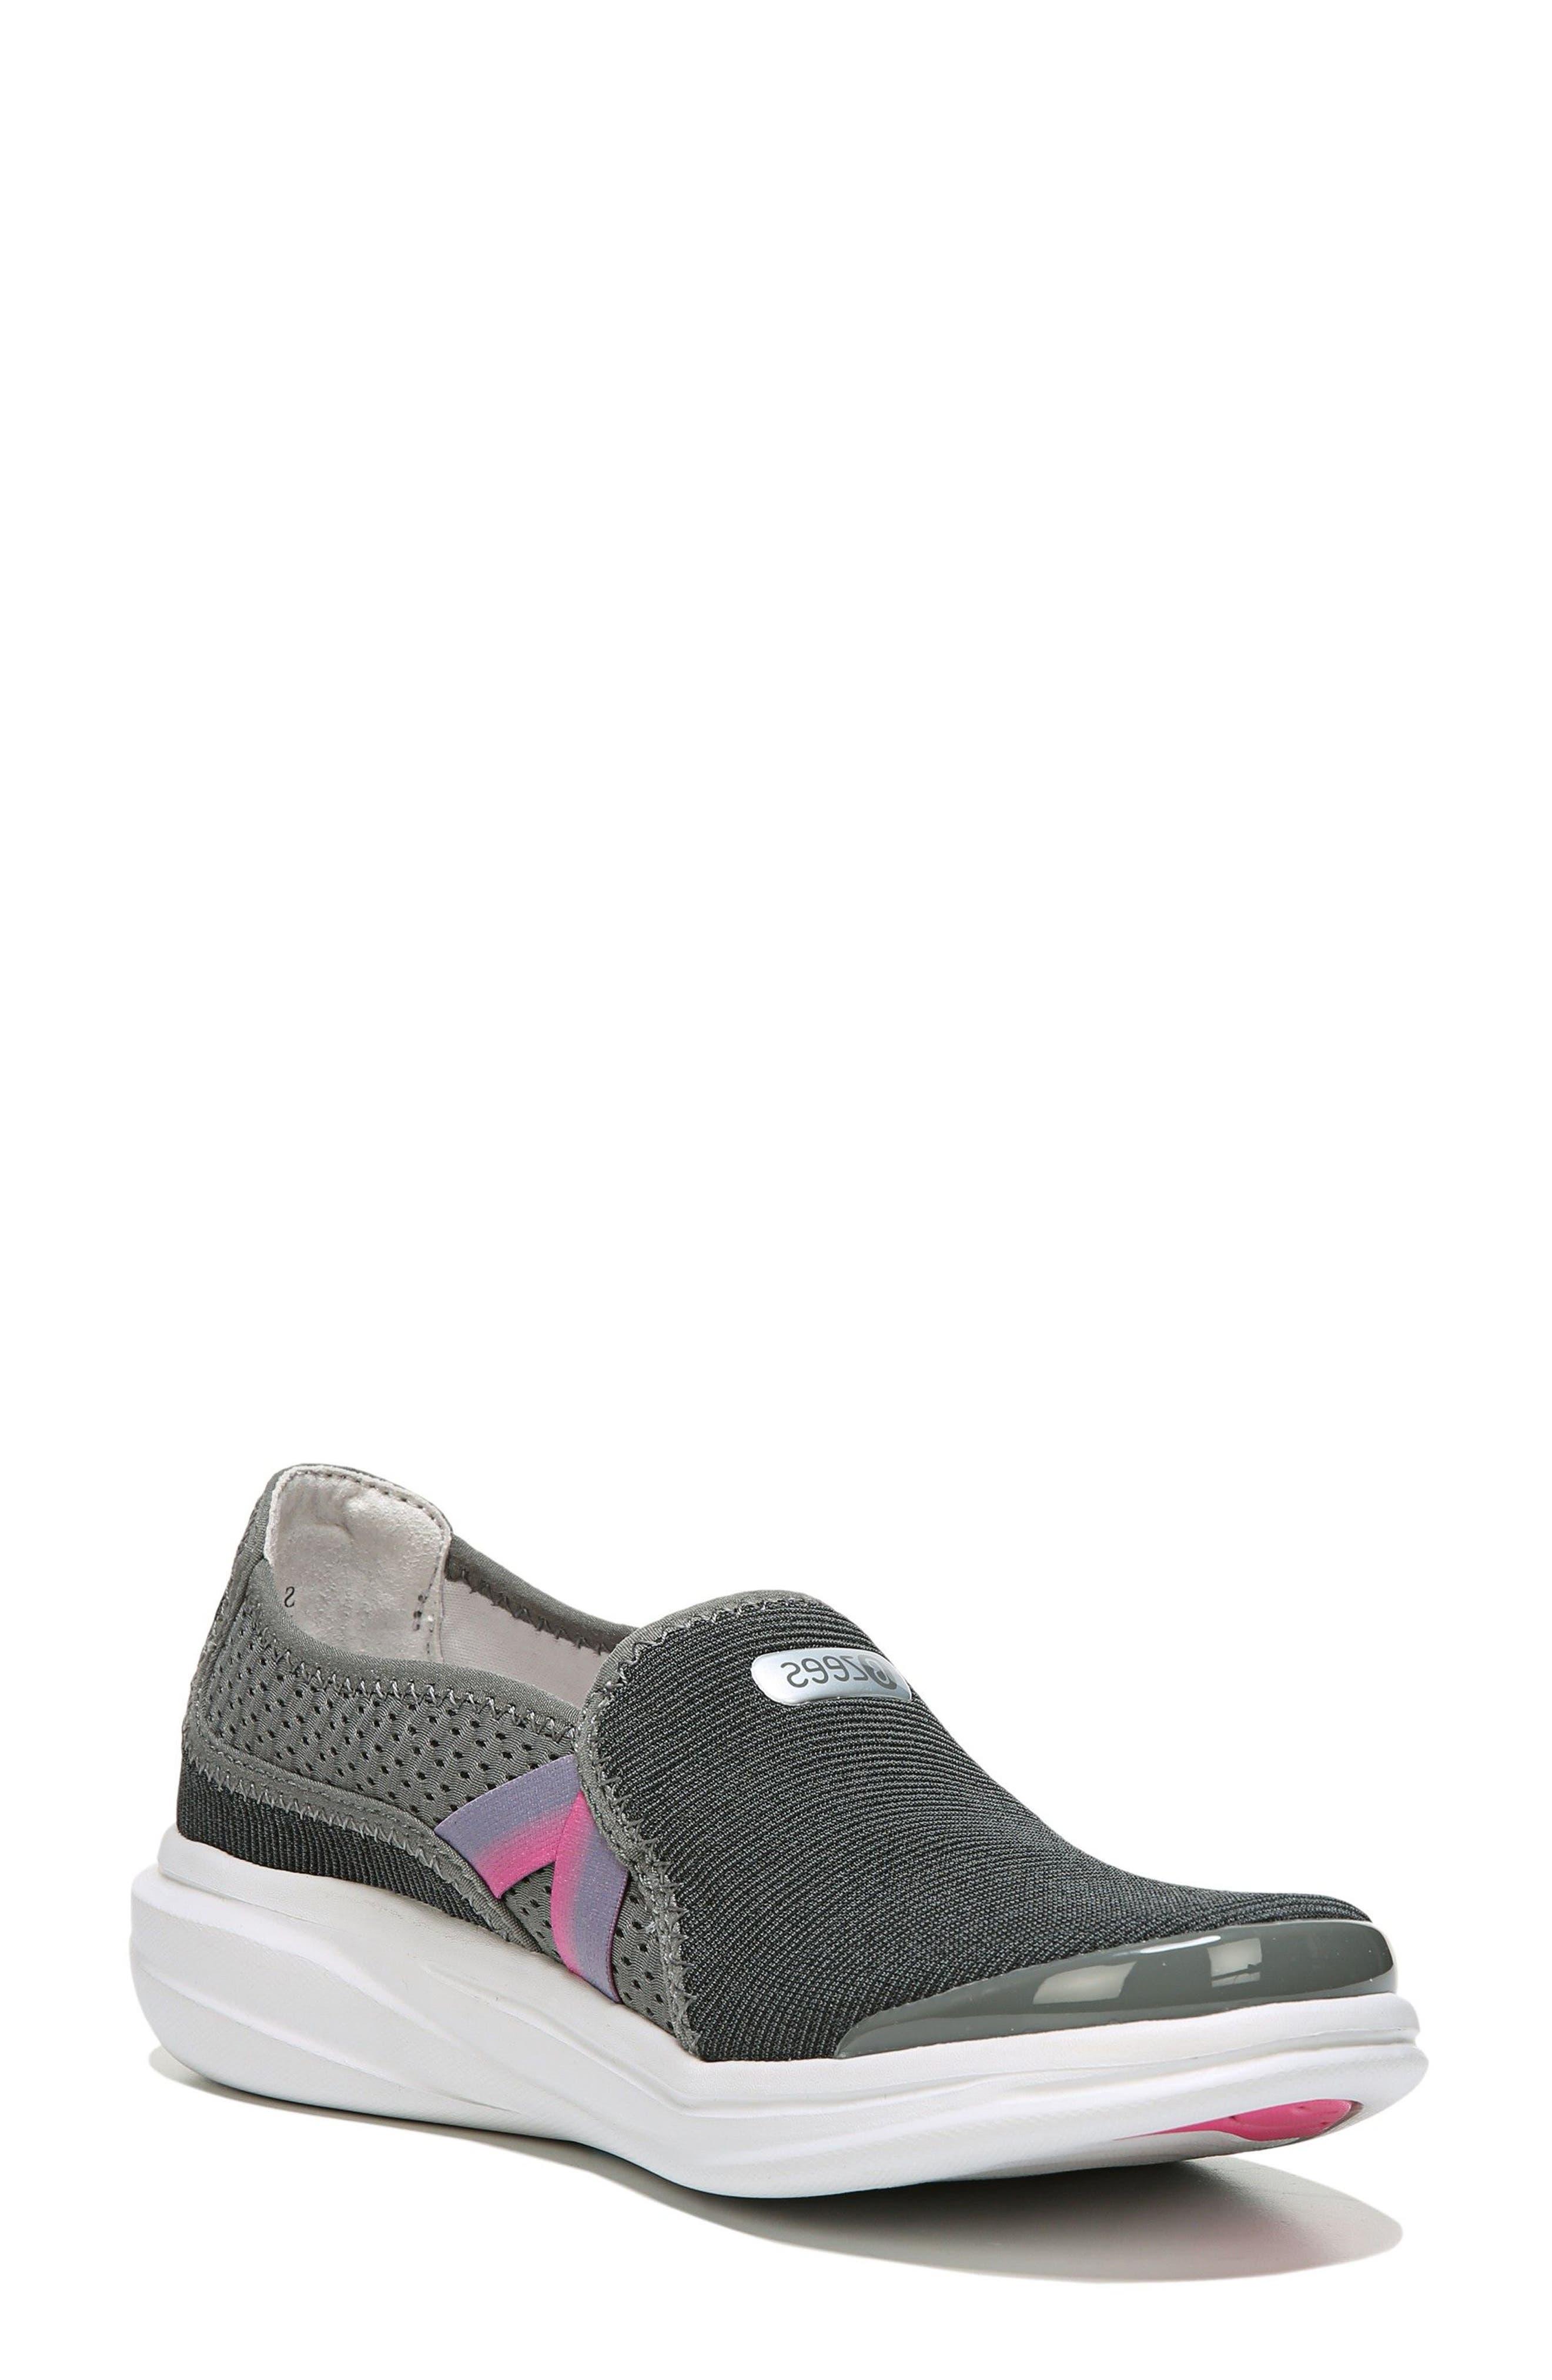 Cruise Slip-On Sneaker,                             Main thumbnail 1, color,                             DARK GREY FABRIC